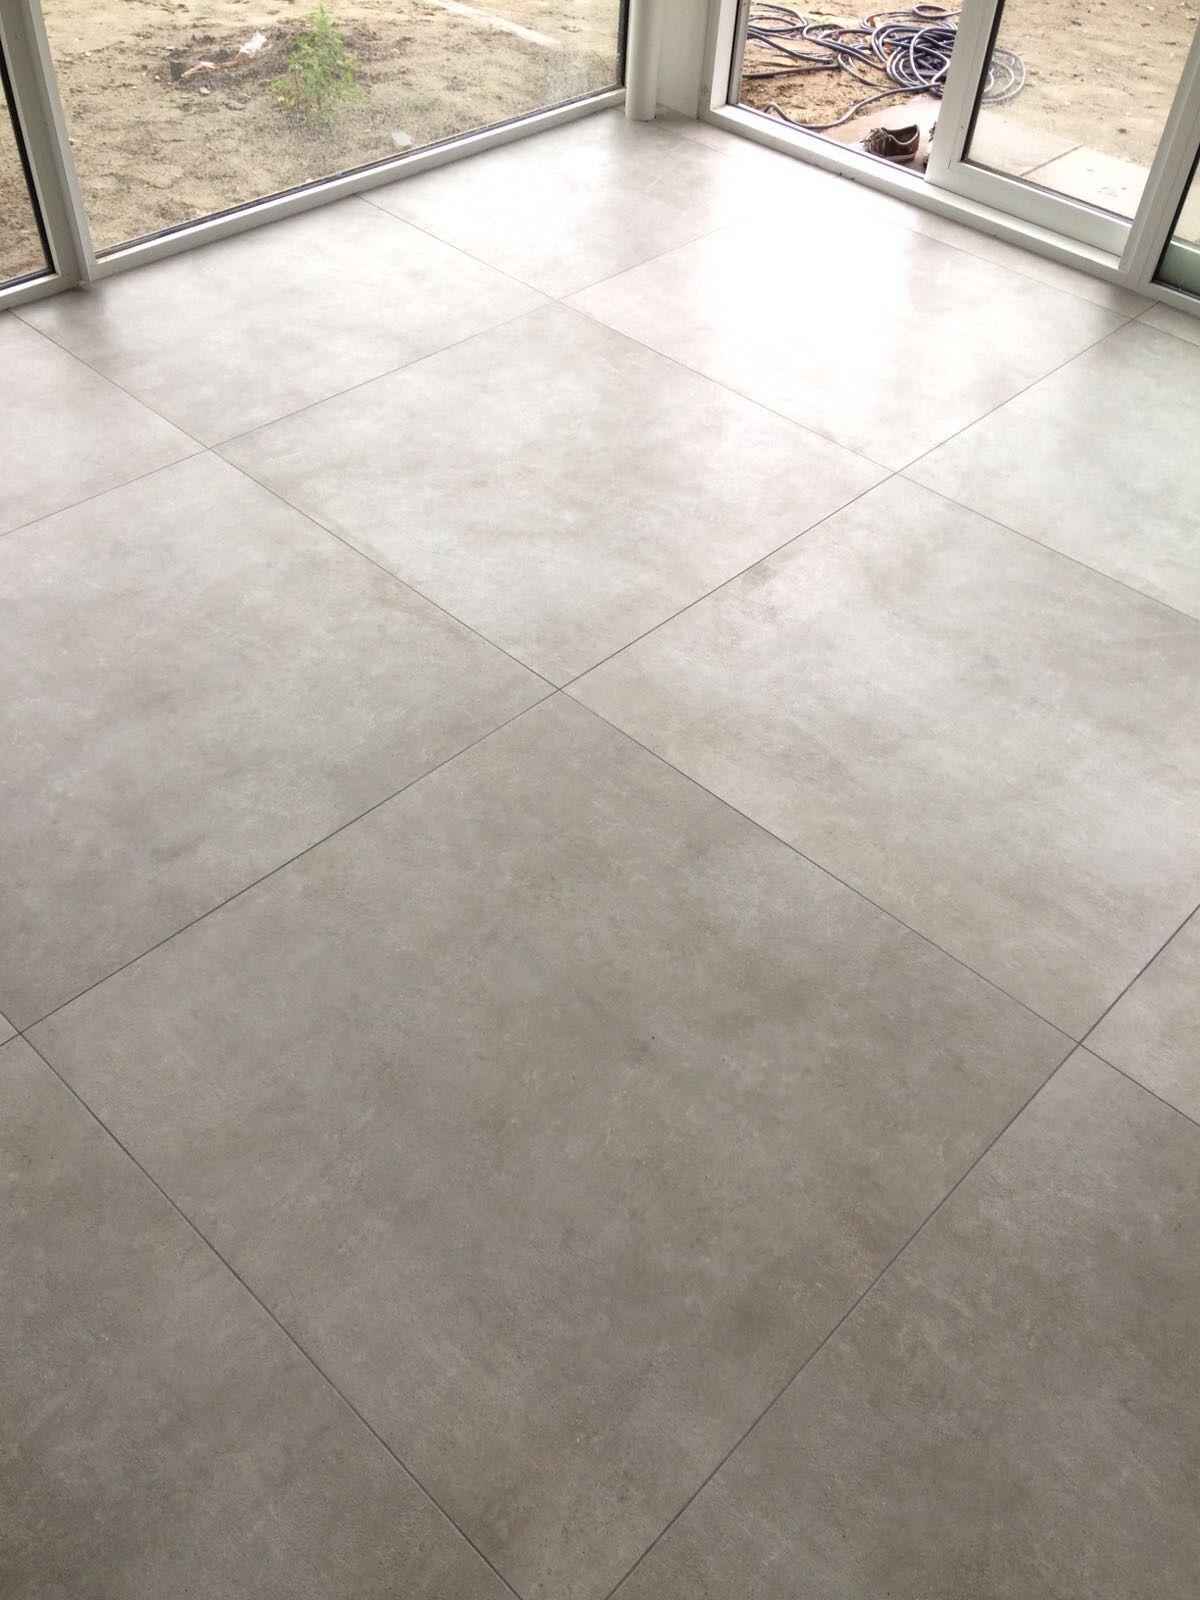 Tuintegels Terrastegels 80x80 Terrastegels.Betonlook Vloertegels 80x80 Cm Unicom Starker In 2019